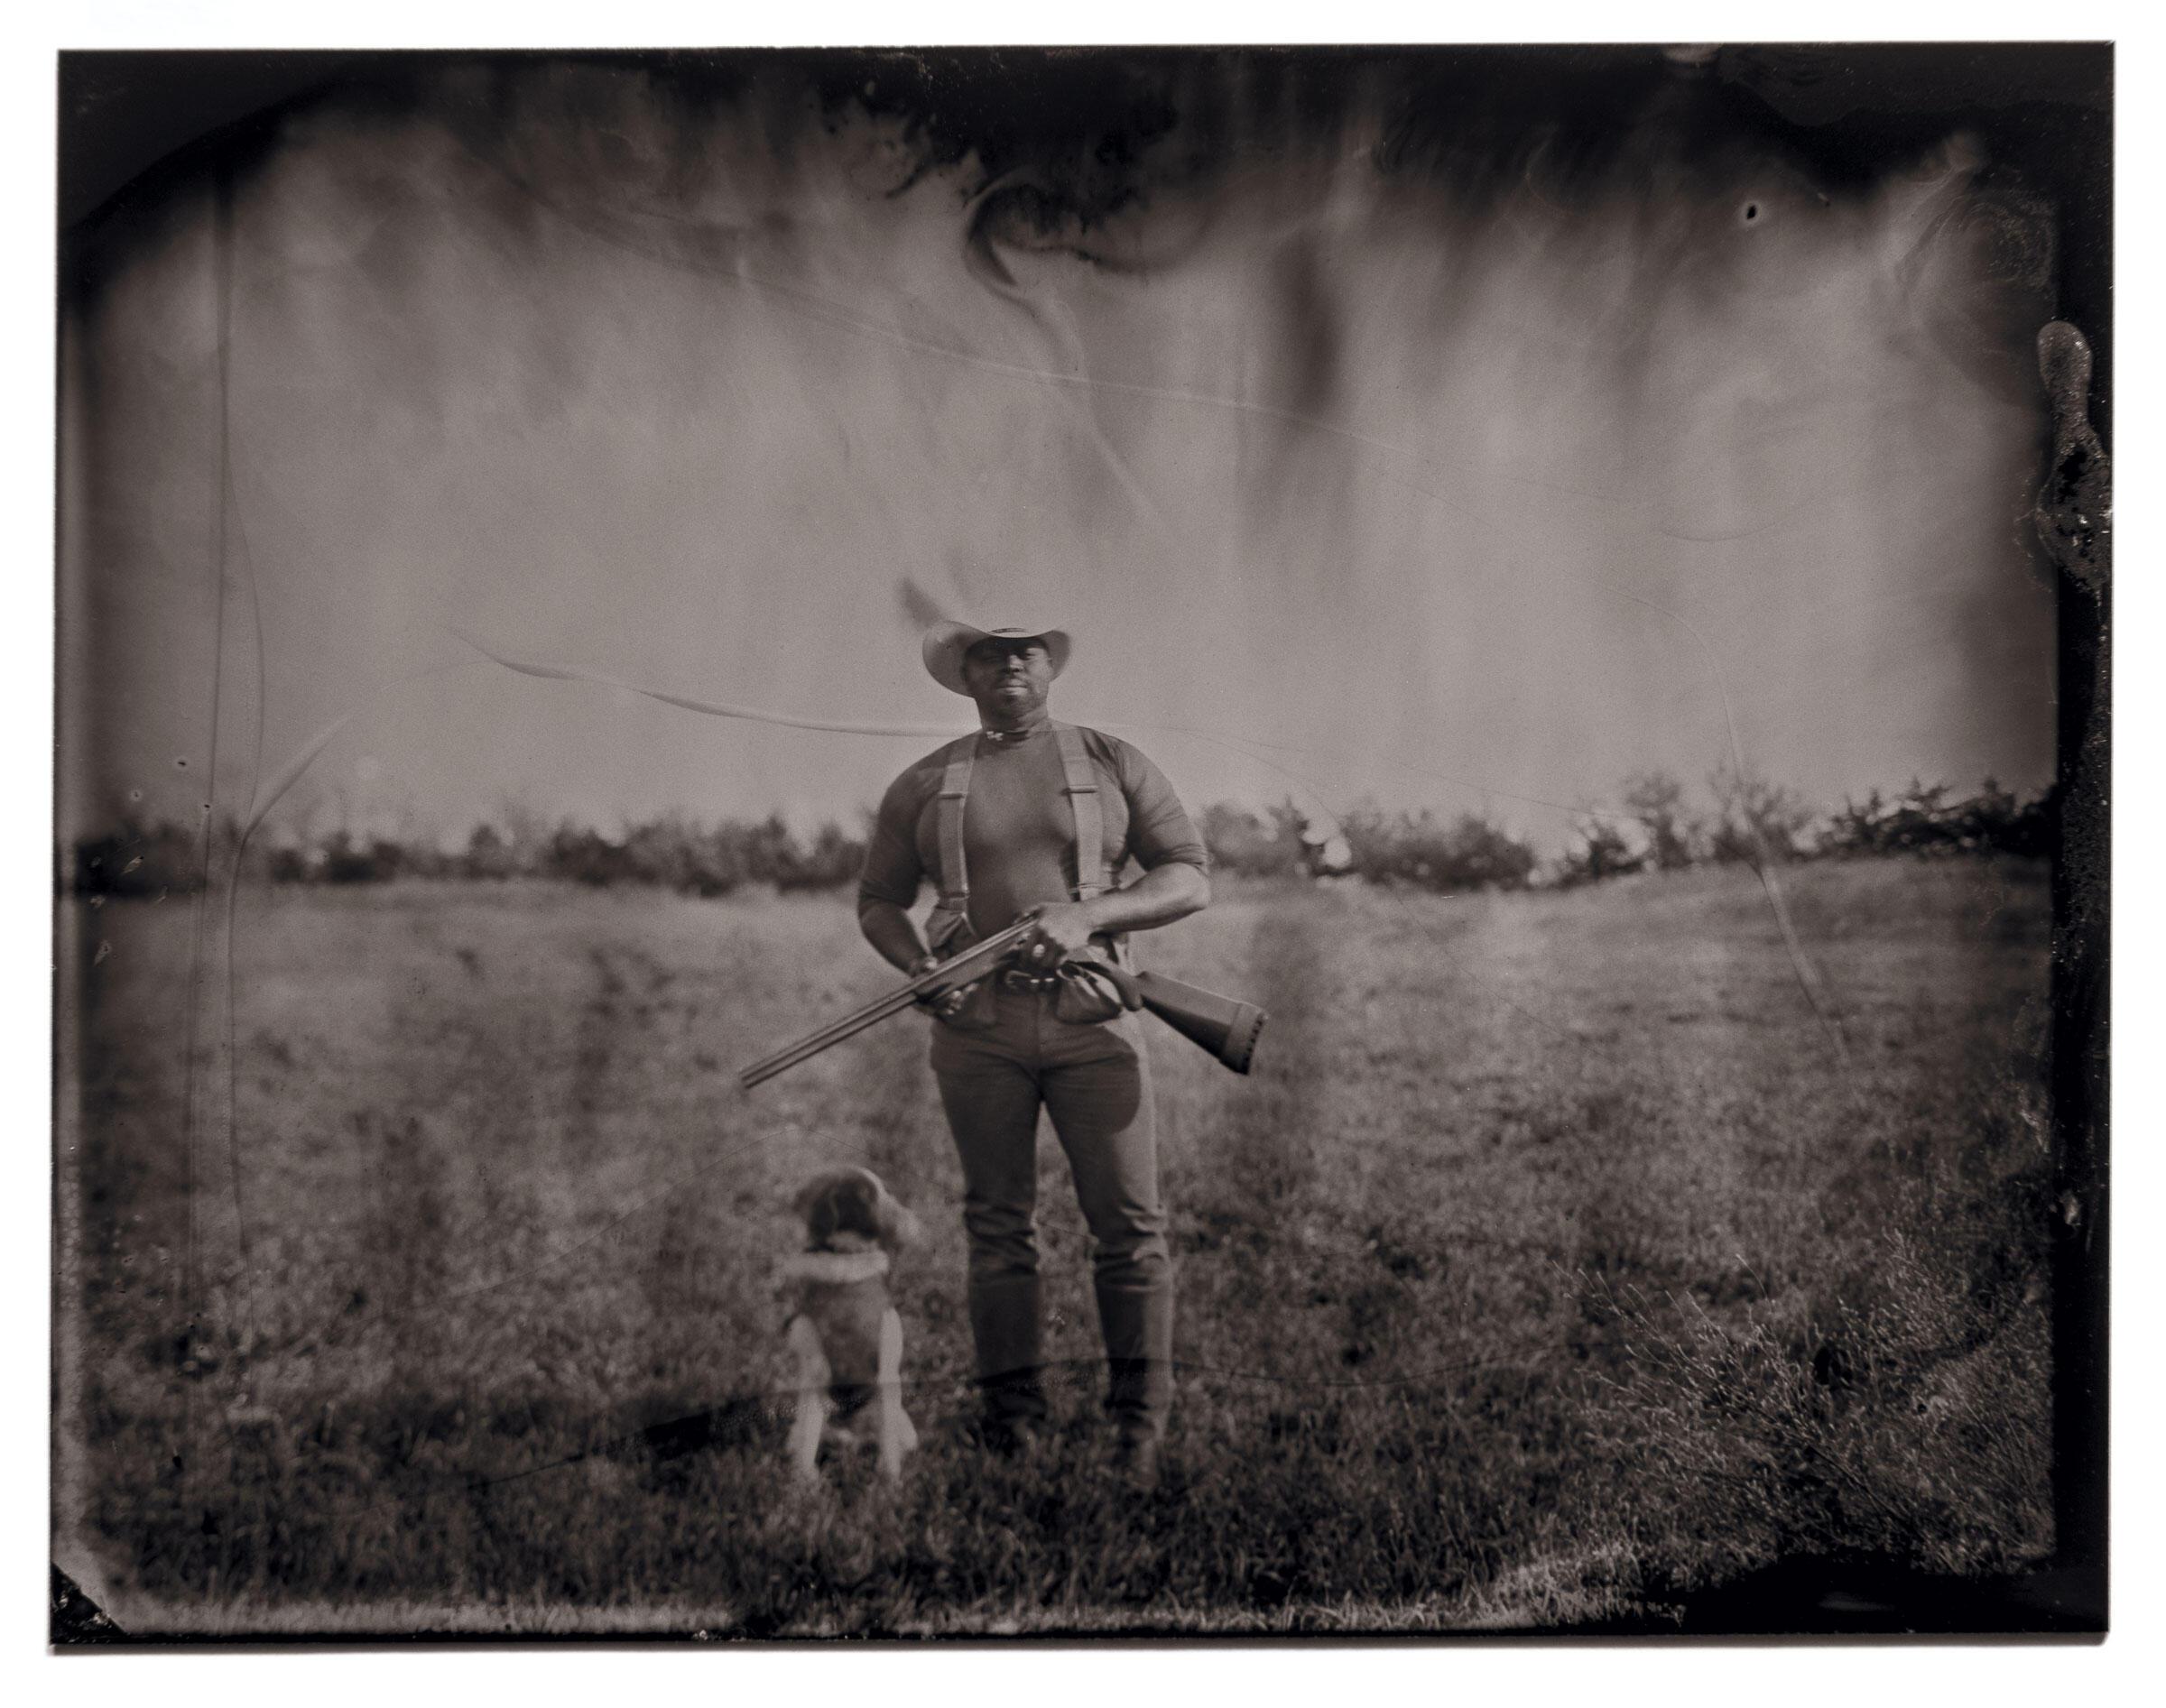 Audubon Dakota's Marshall Johnson and his bird dog, Ulysses S. Grant. Tom Fowlks